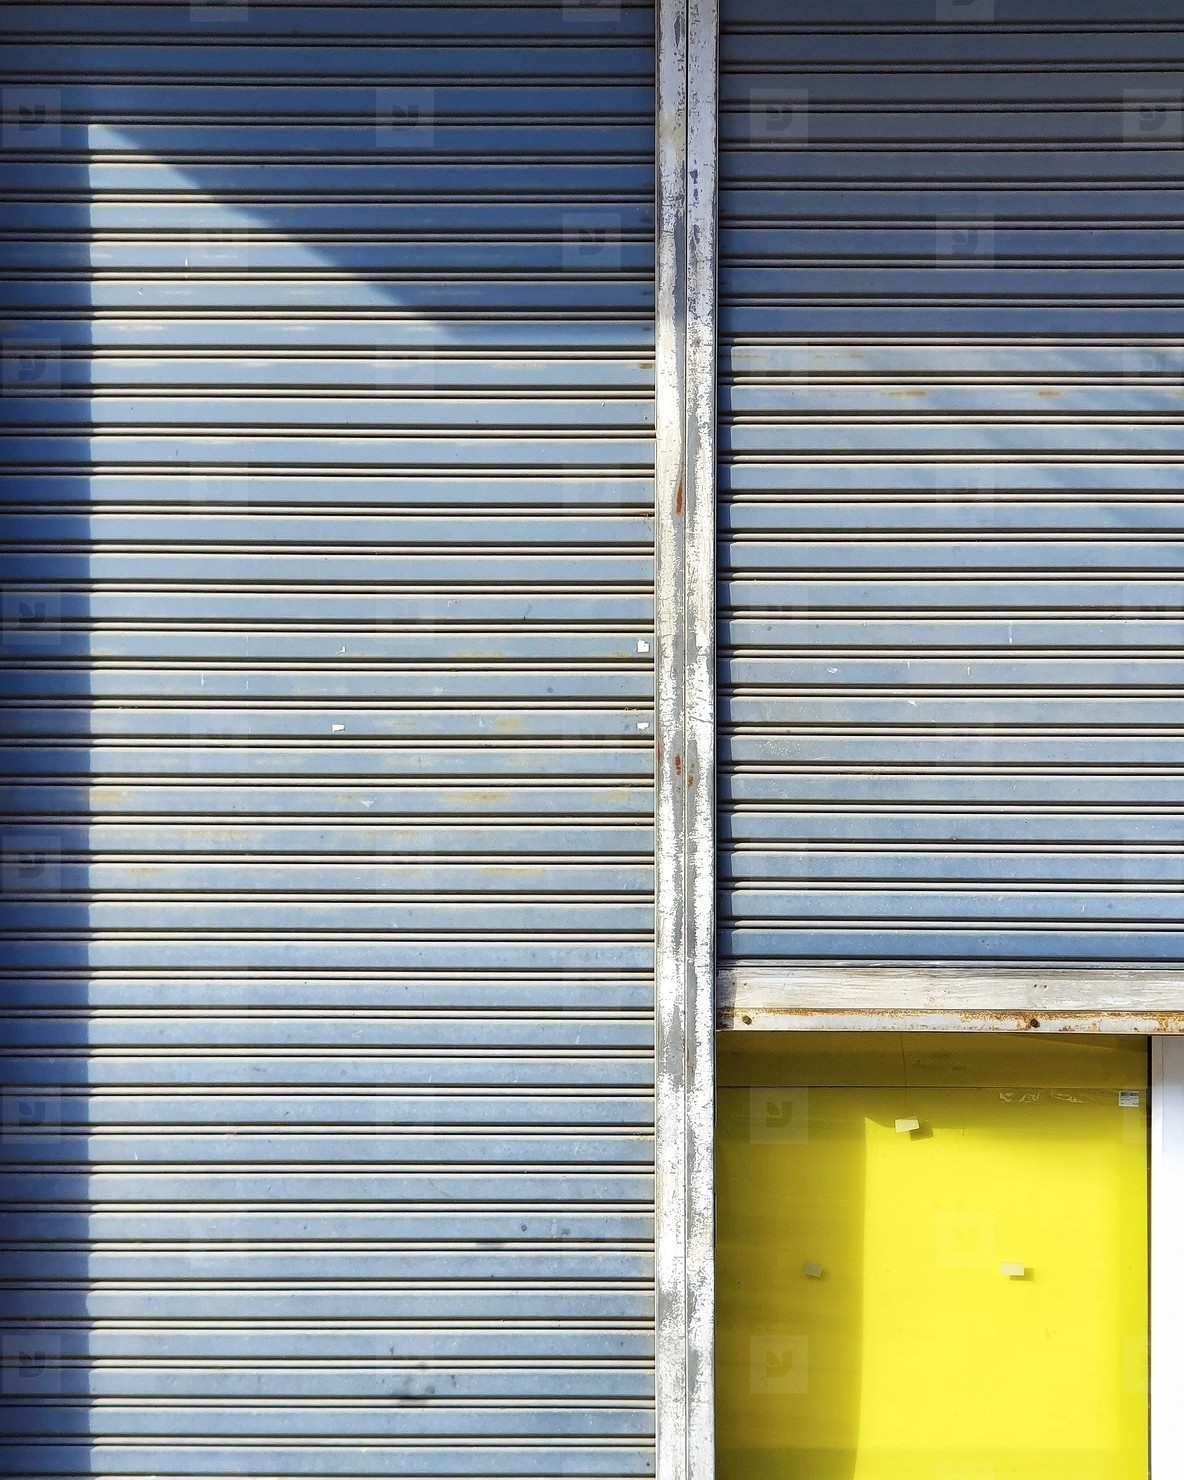 Vintage sheet steel door pattern